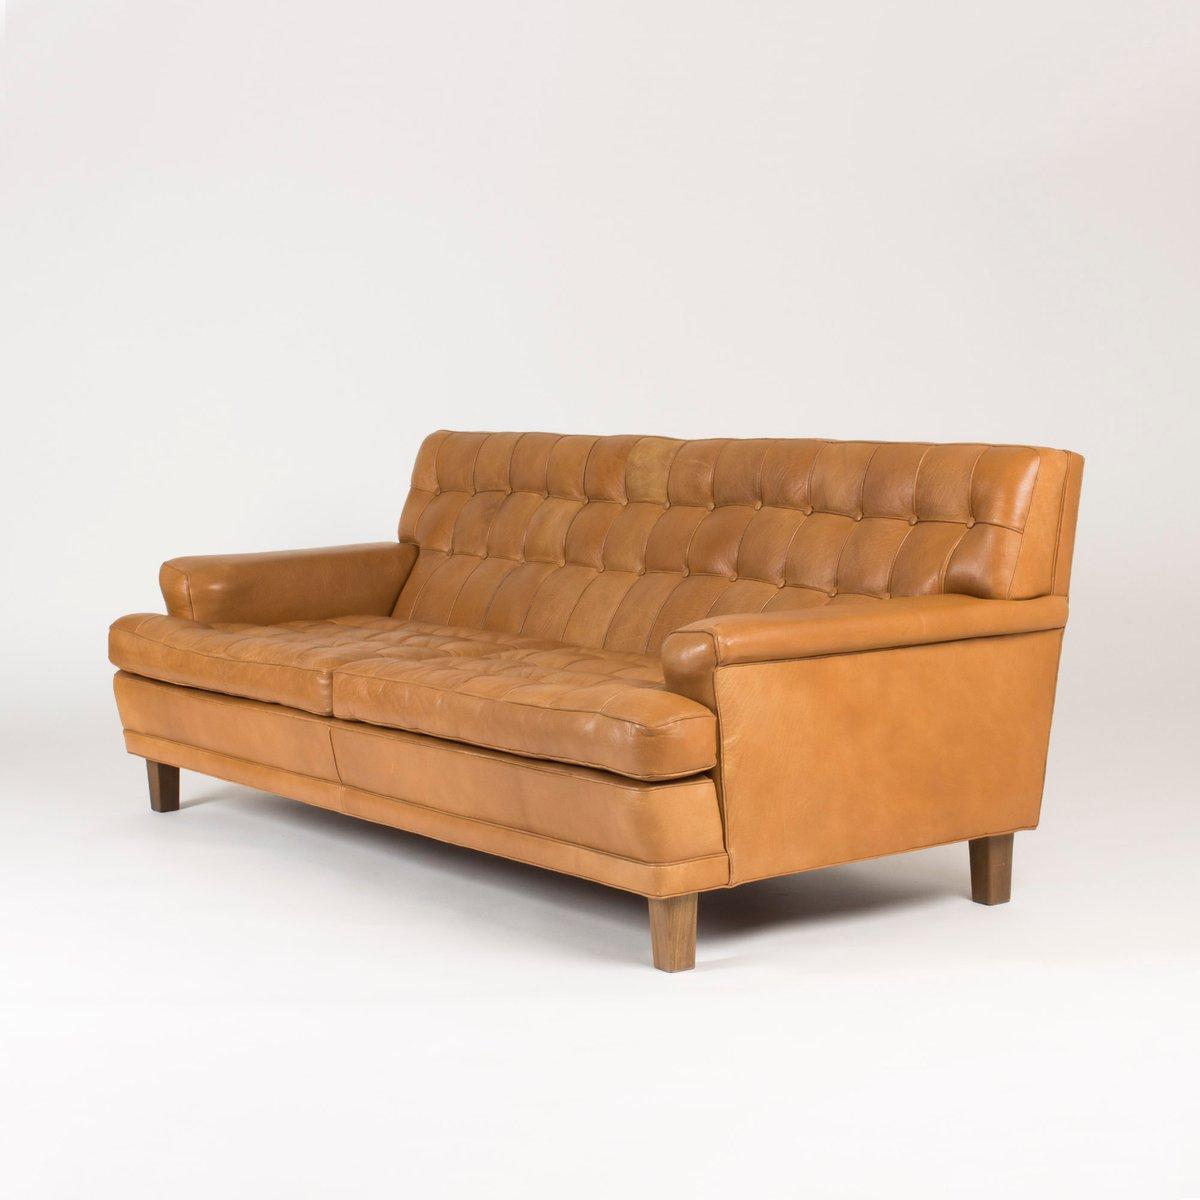 leder sofa von arne norell 1960er bei pamono kaufen. Black Bedroom Furniture Sets. Home Design Ideas